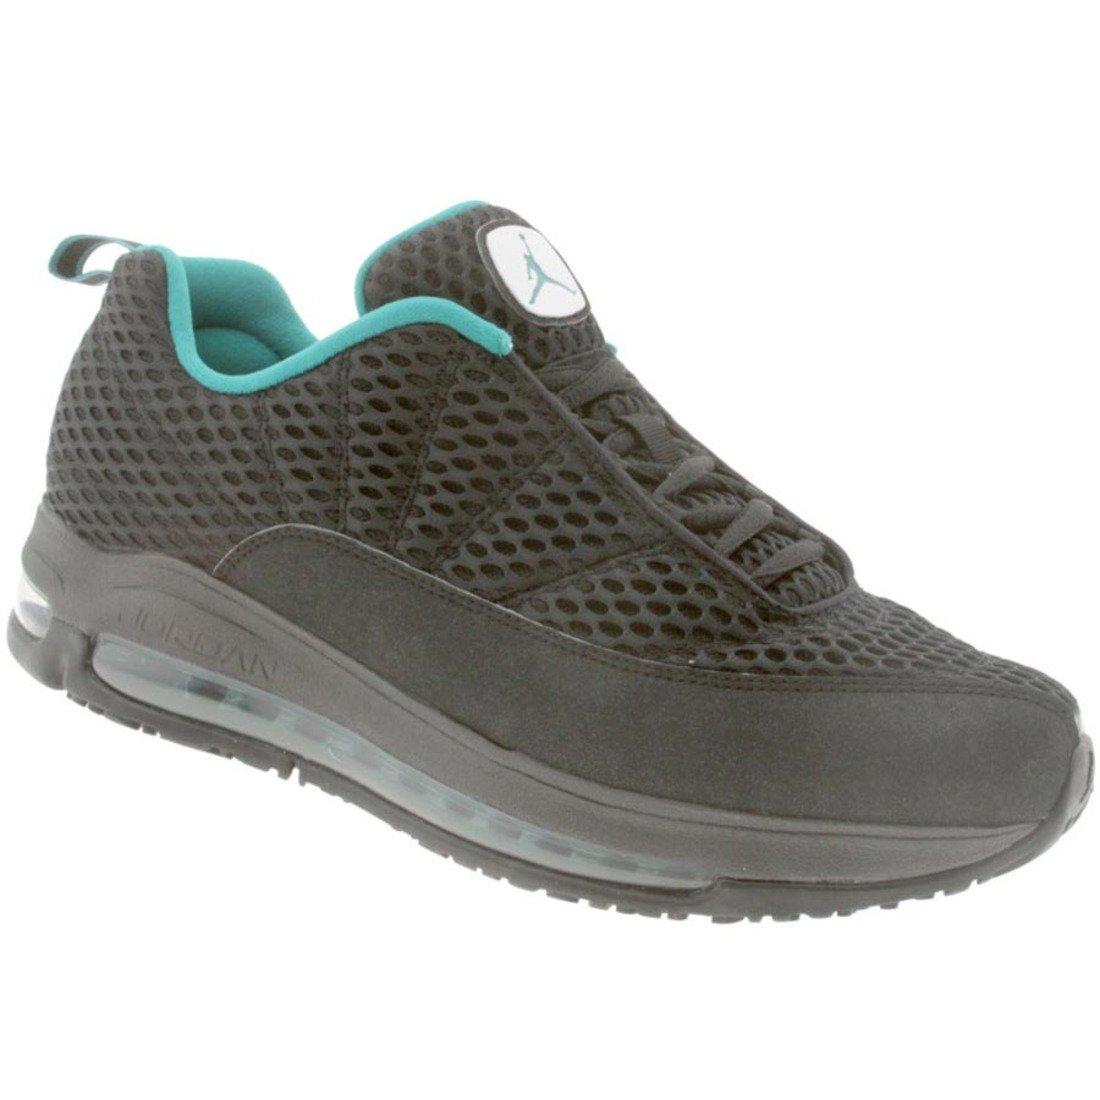 Jordan Comfort Max 12 Men s Basketball Shoes – Black Fresh Water Midnight Fog